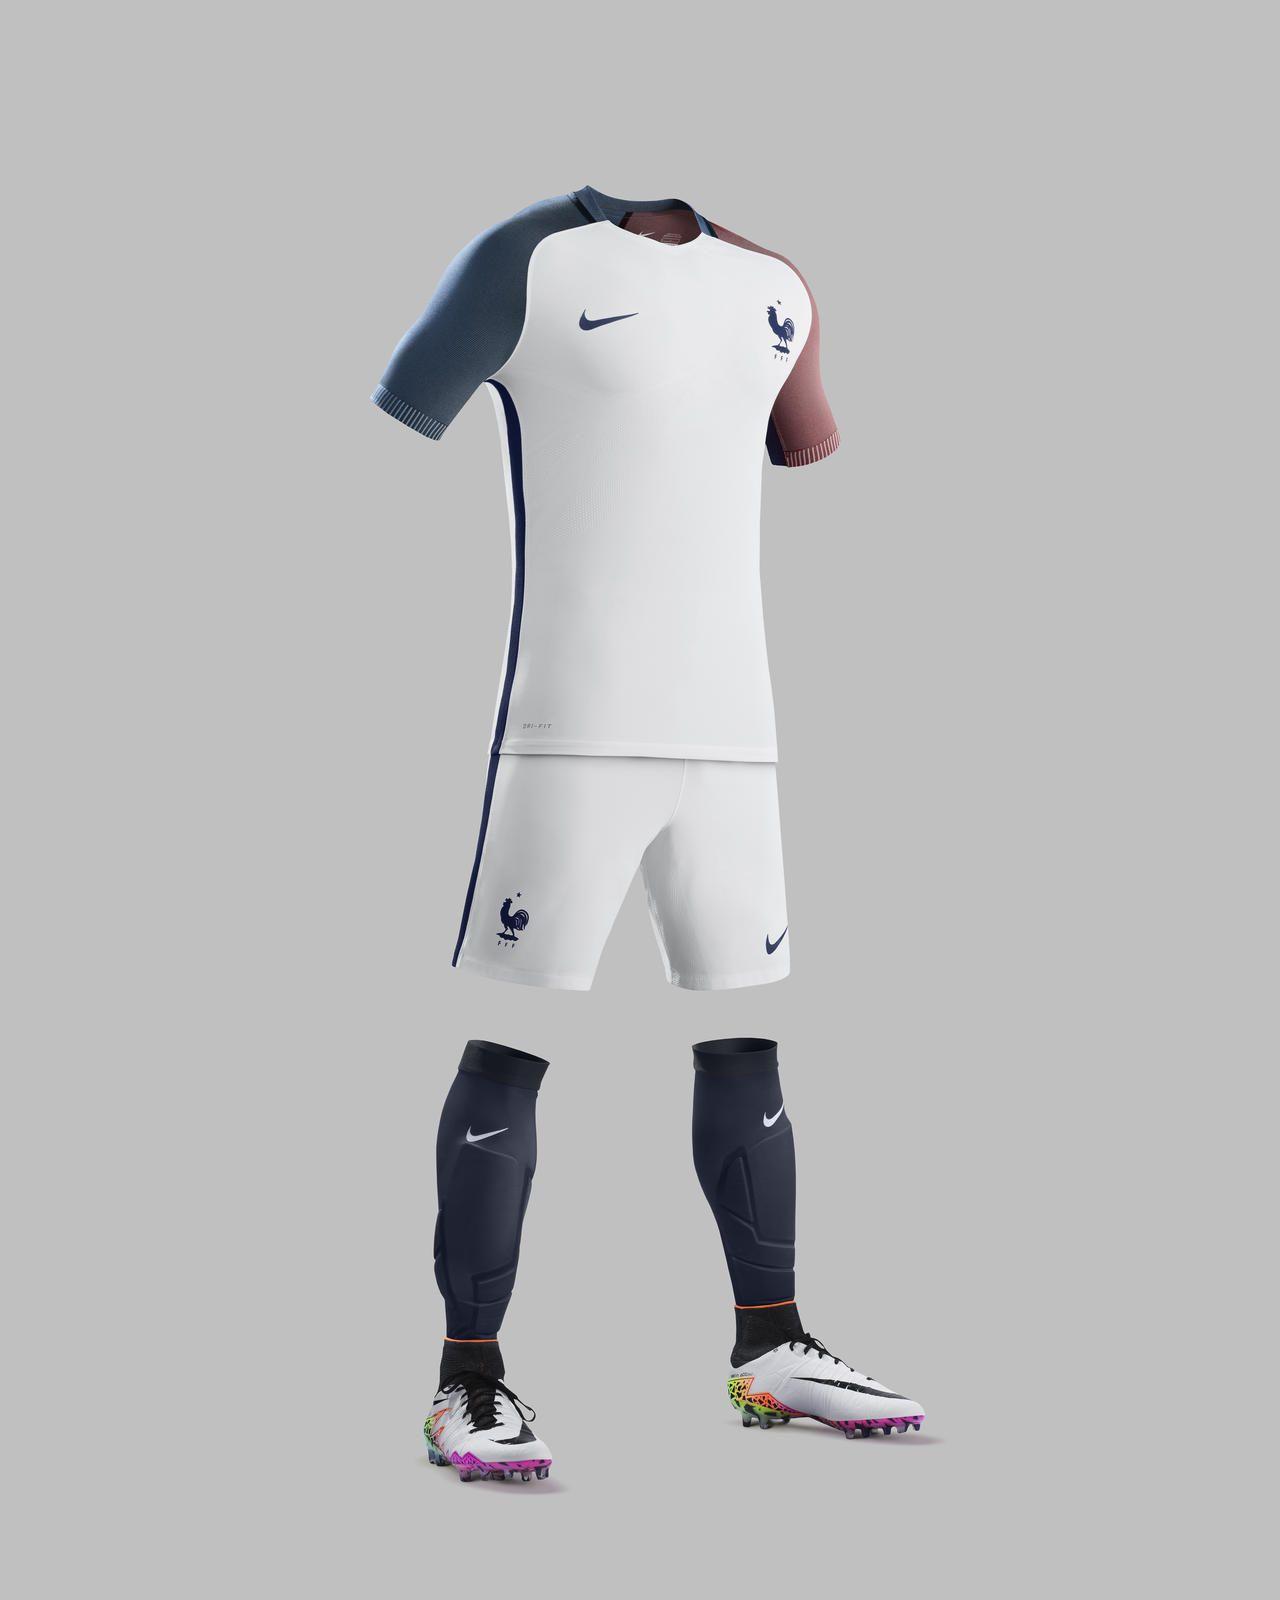 3f5ac2f0a62 France 'Euro 2016' Nike Away Shirt